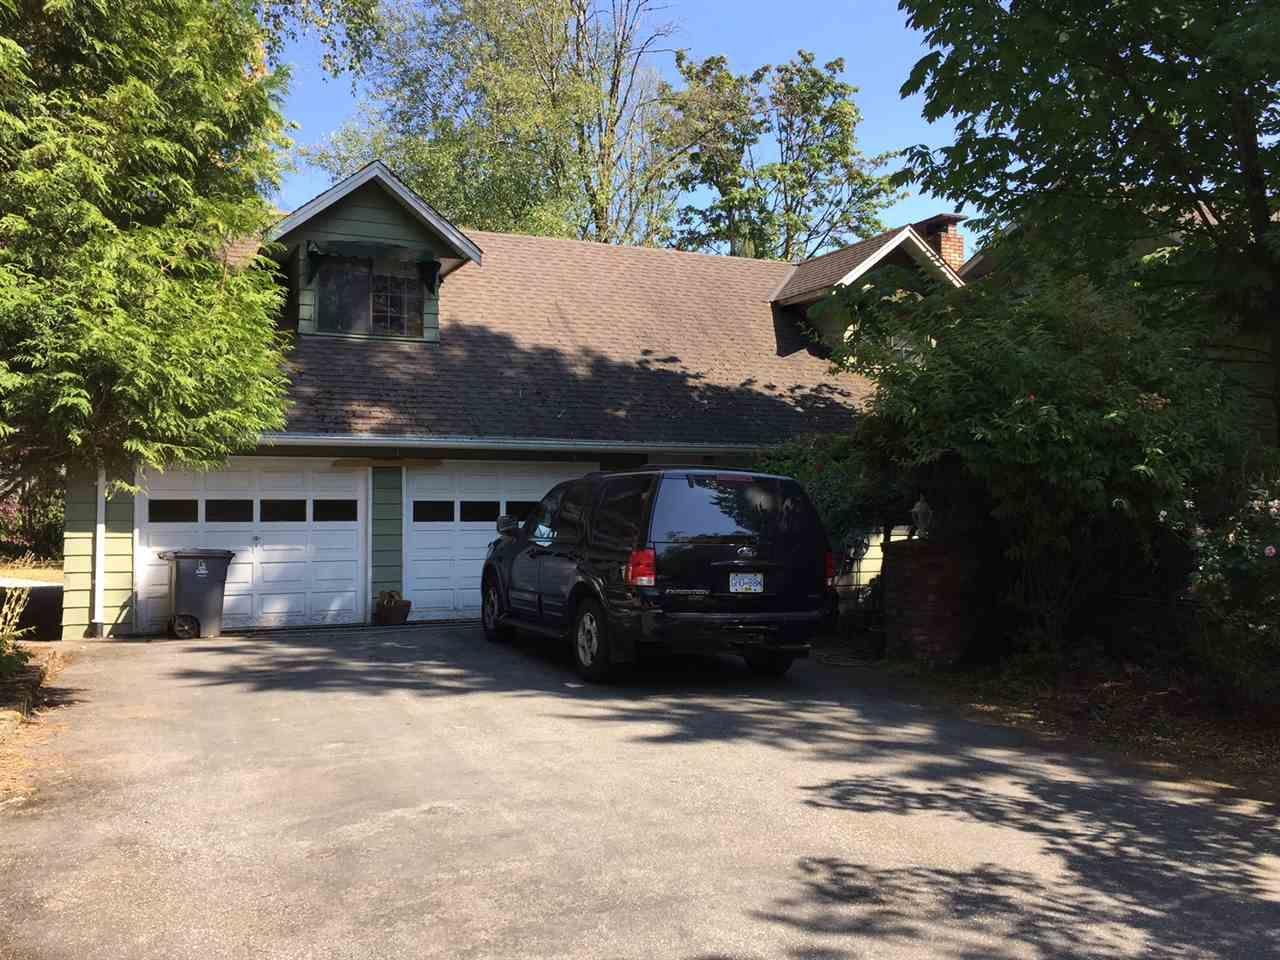 Main Photo: 9330 178 Street in Surrey: Port Kells House for sale (North Surrey)  : MLS®# R2296259